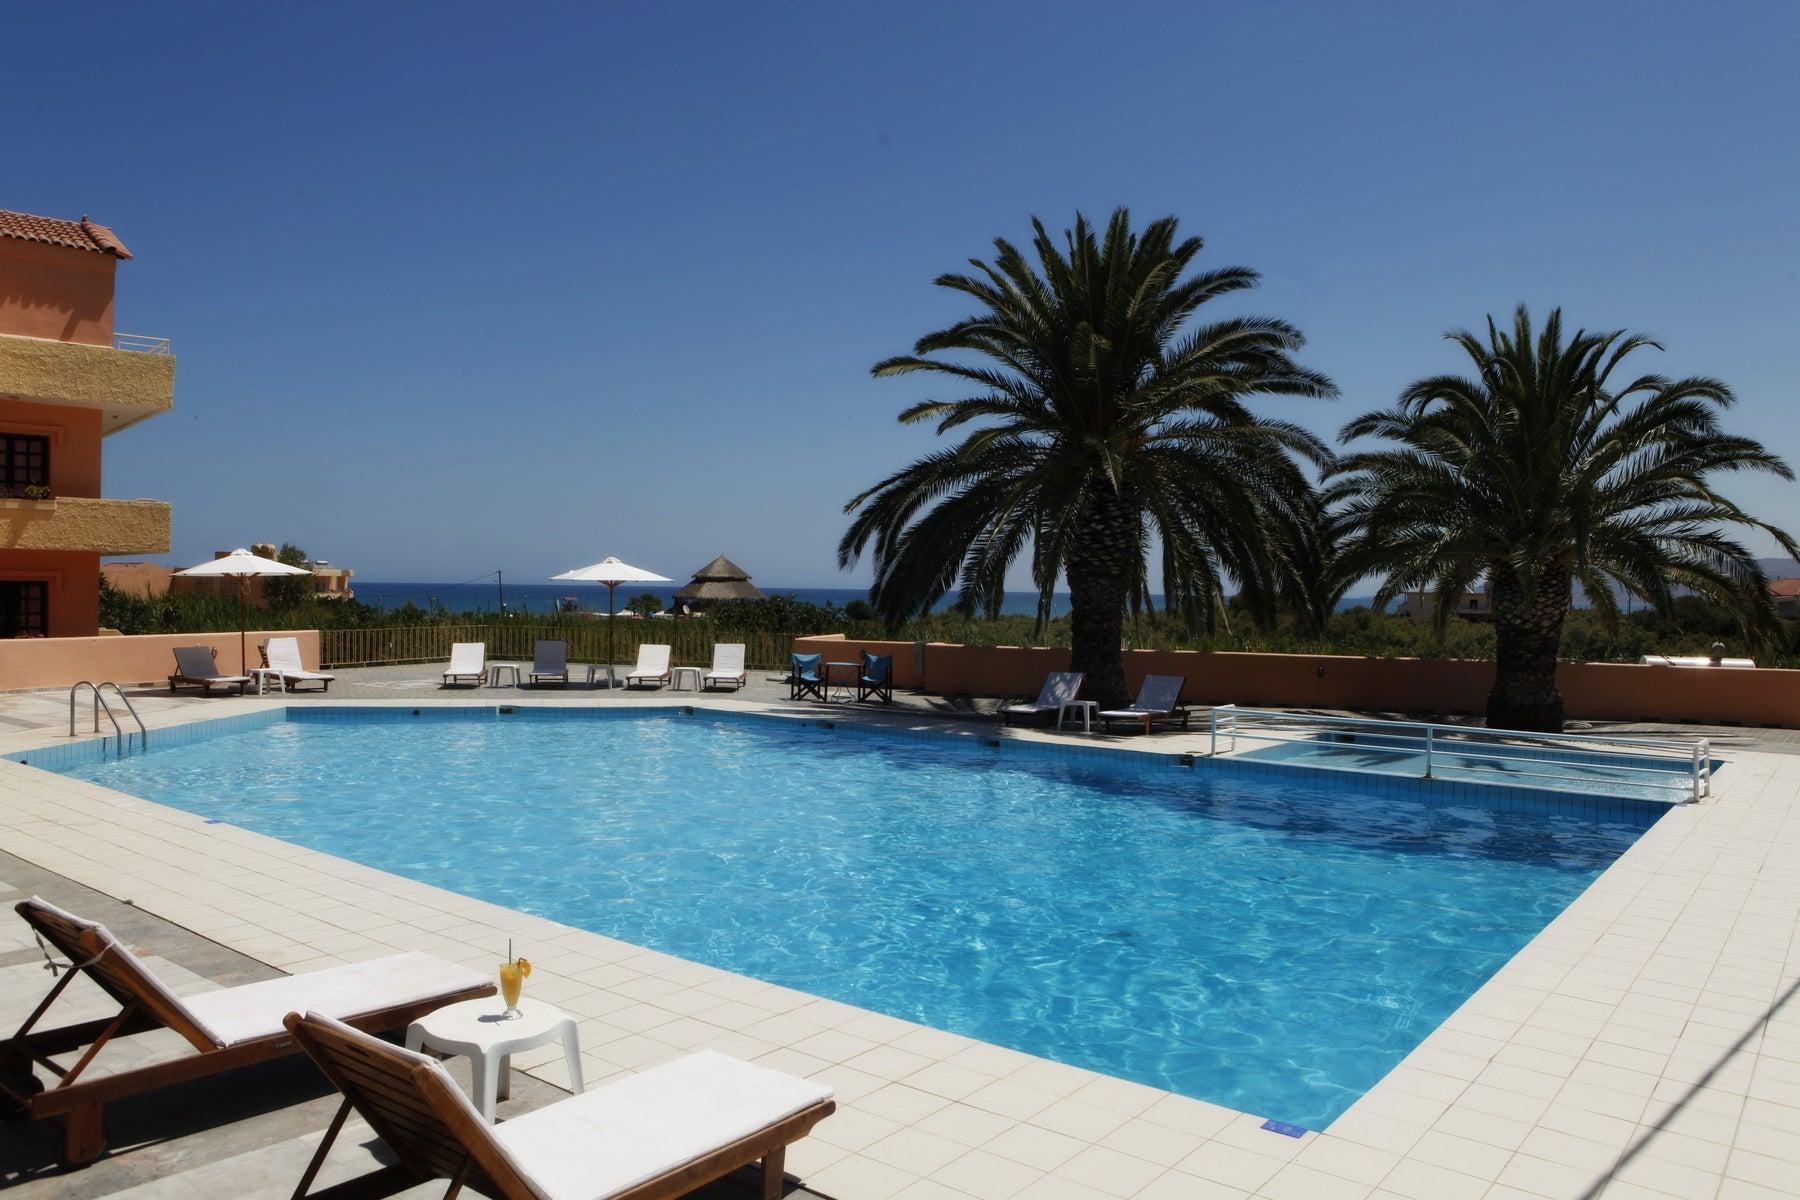 Fereniki Hotel in Georgioupolis Crete Holidays